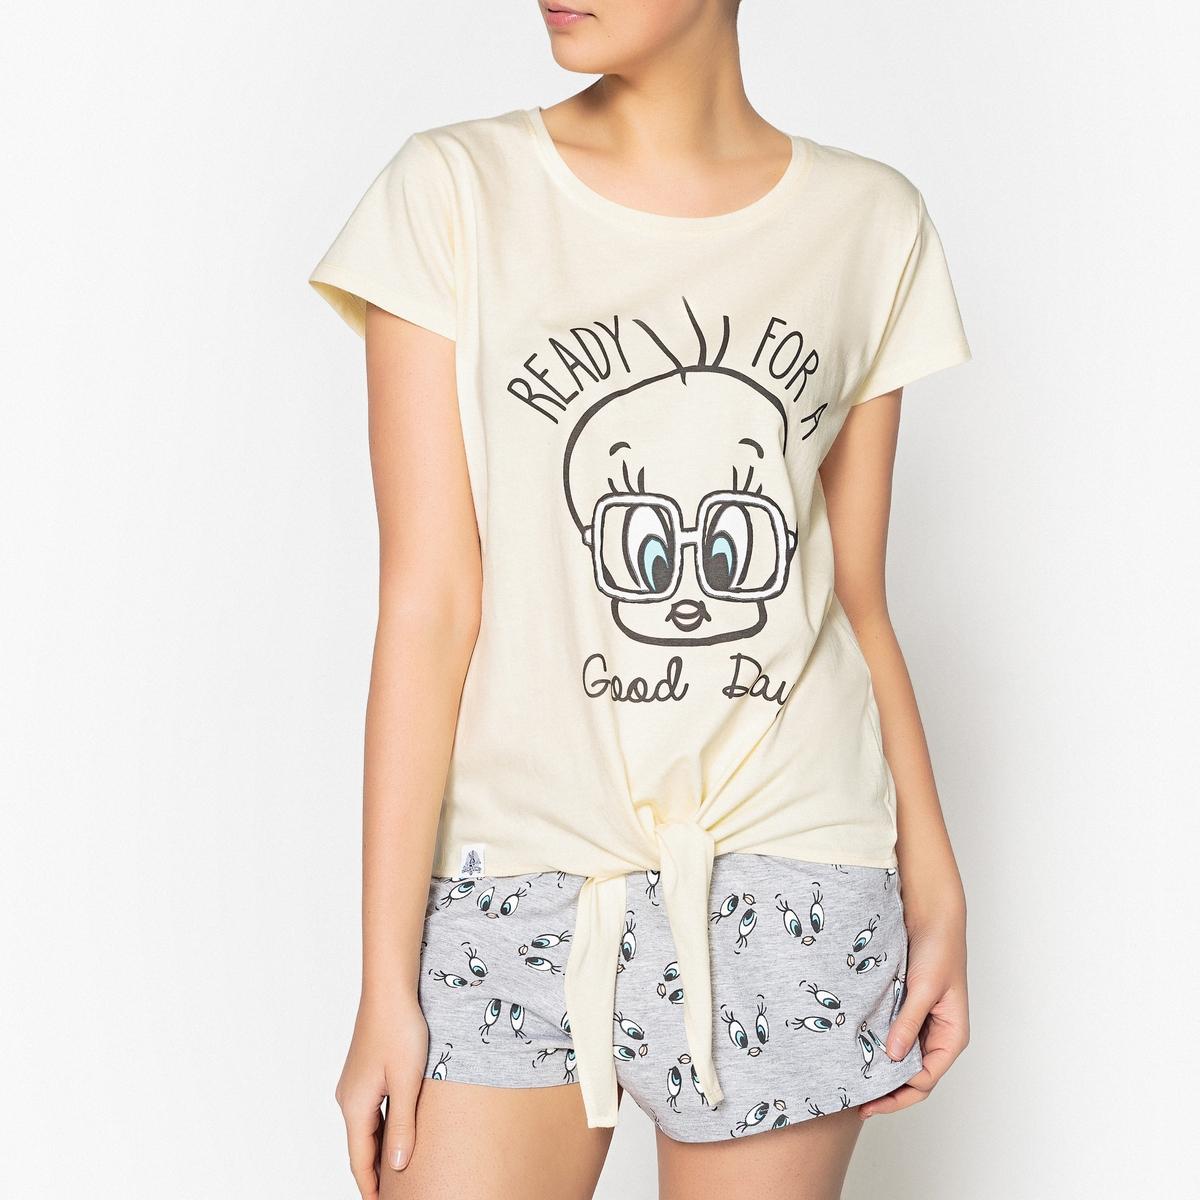 Пижама с рисунком, с шортами Titi solo1 с